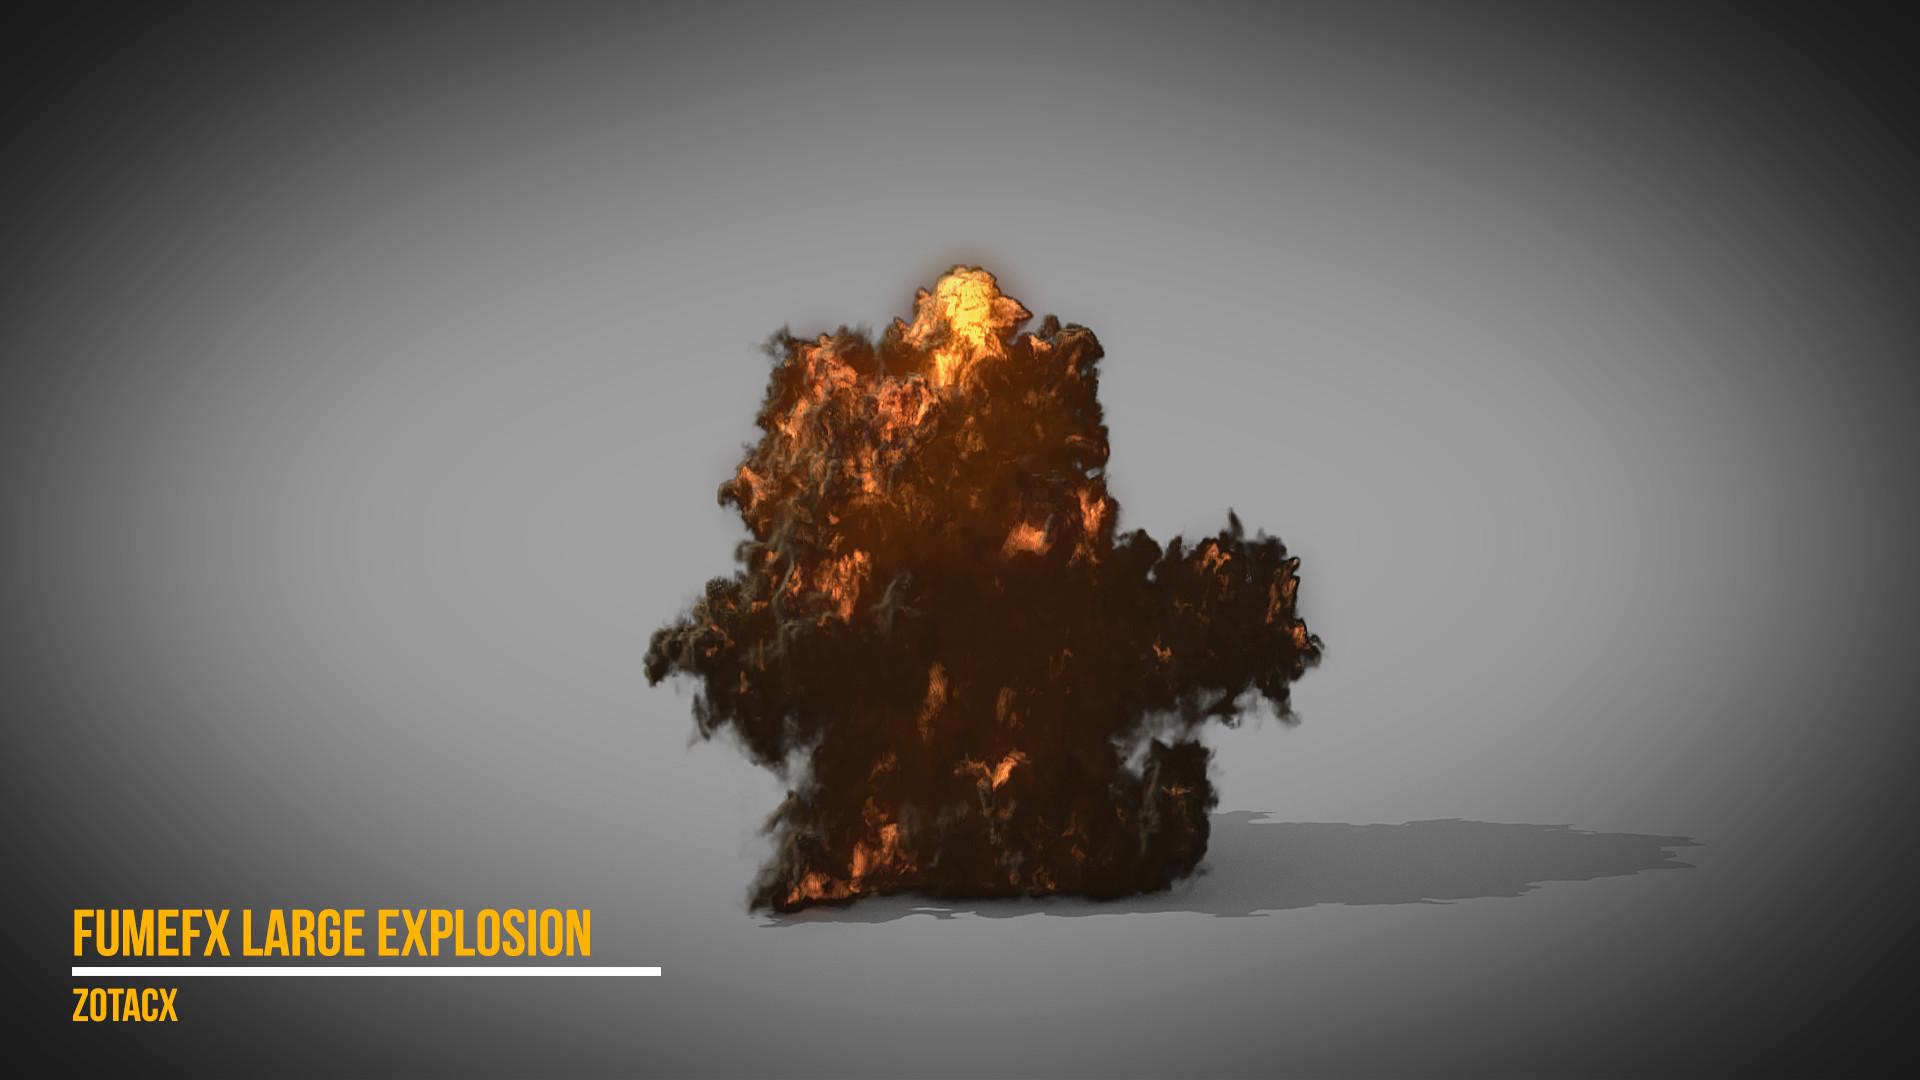 ArtStation - Large Explosion - VFX Breakdown, Rodrigo García